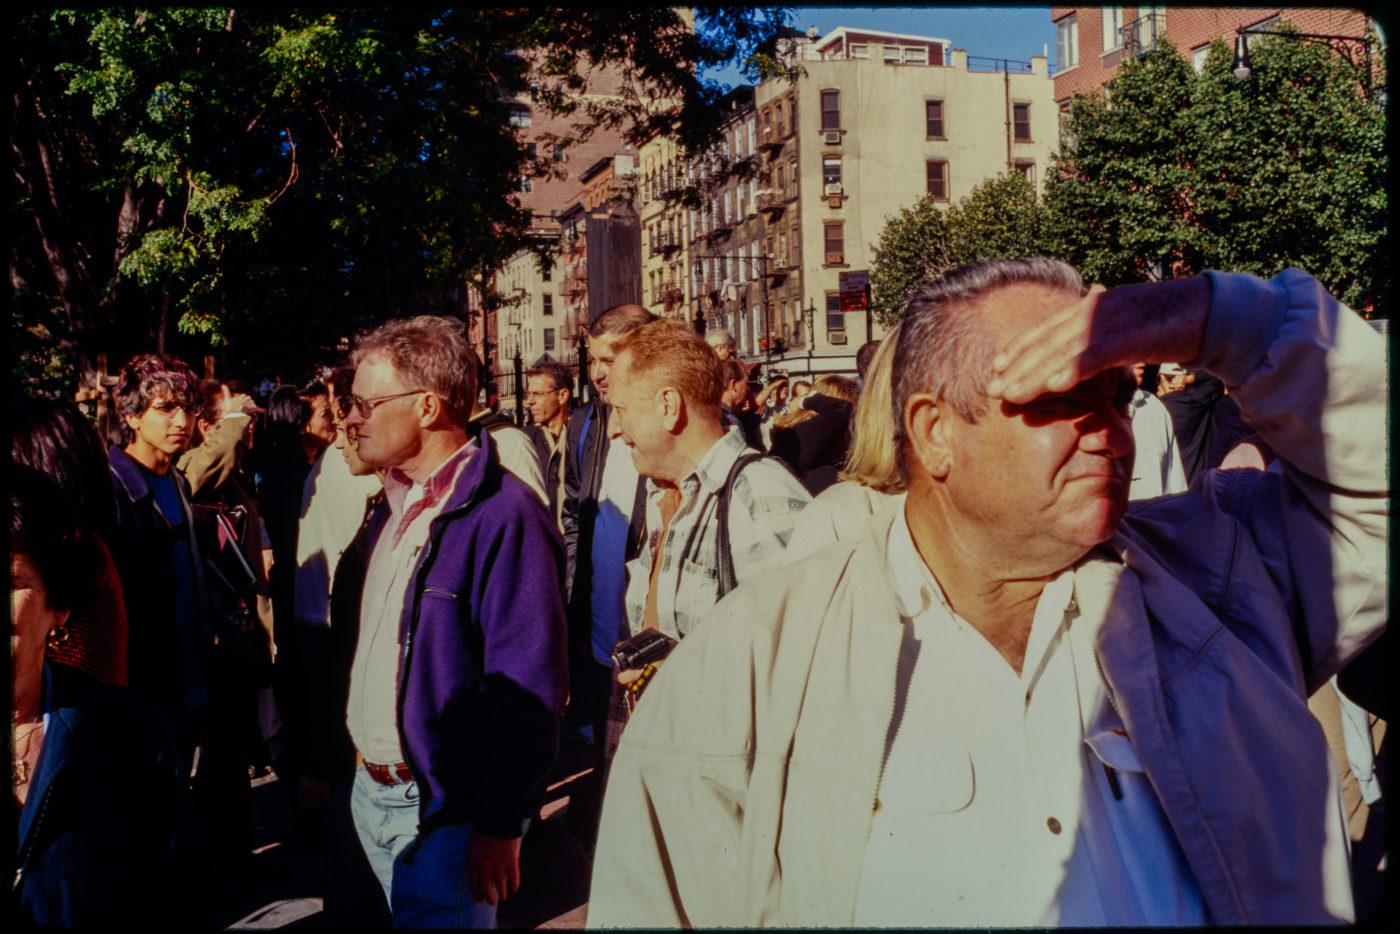 Sun Beams on Crowds of New Yorkers on Chambers Street.jpg